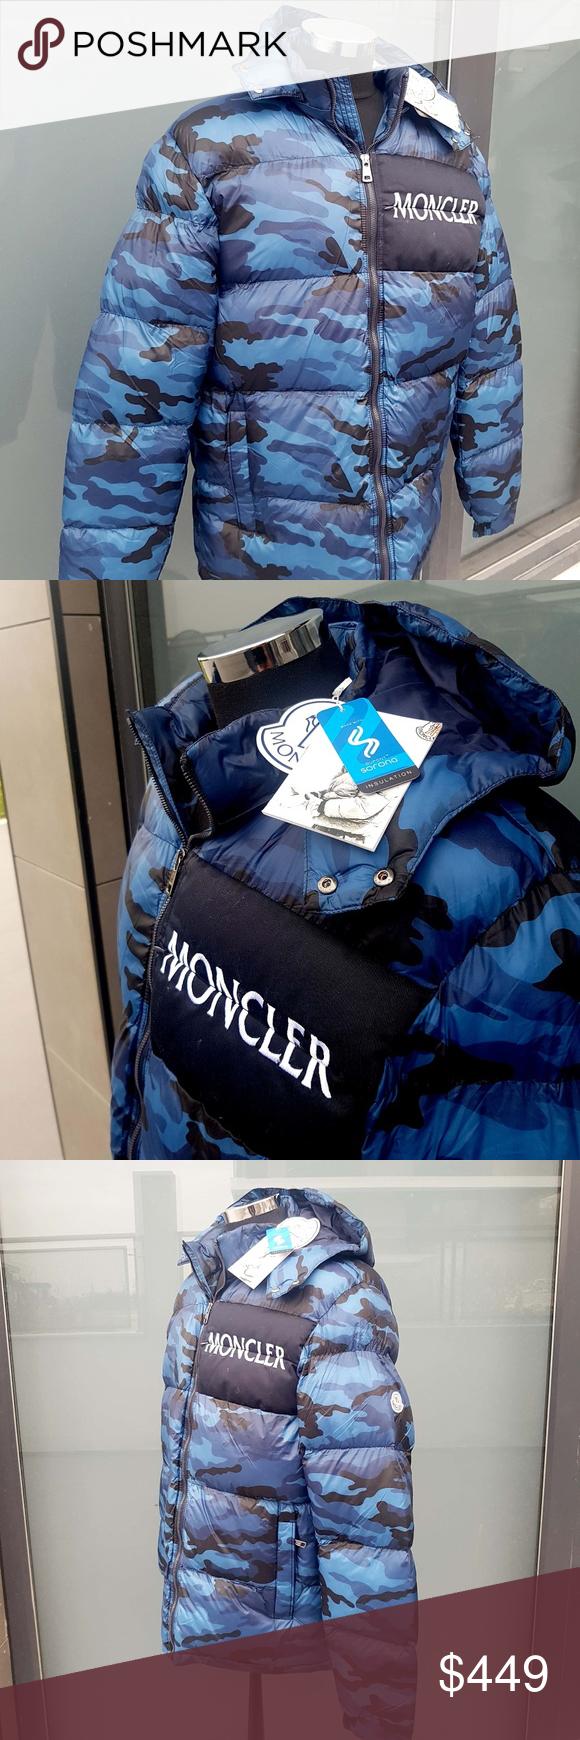 Moncler Aiton Down Puffer Jacket In Camo Moncler Aiton Down Puffer Jacket In Camo Color Blue Camo Size Xxl Moncler Puffer Jackets Moncler Jacket Moncler [ 1740 x 580 Pixel ]